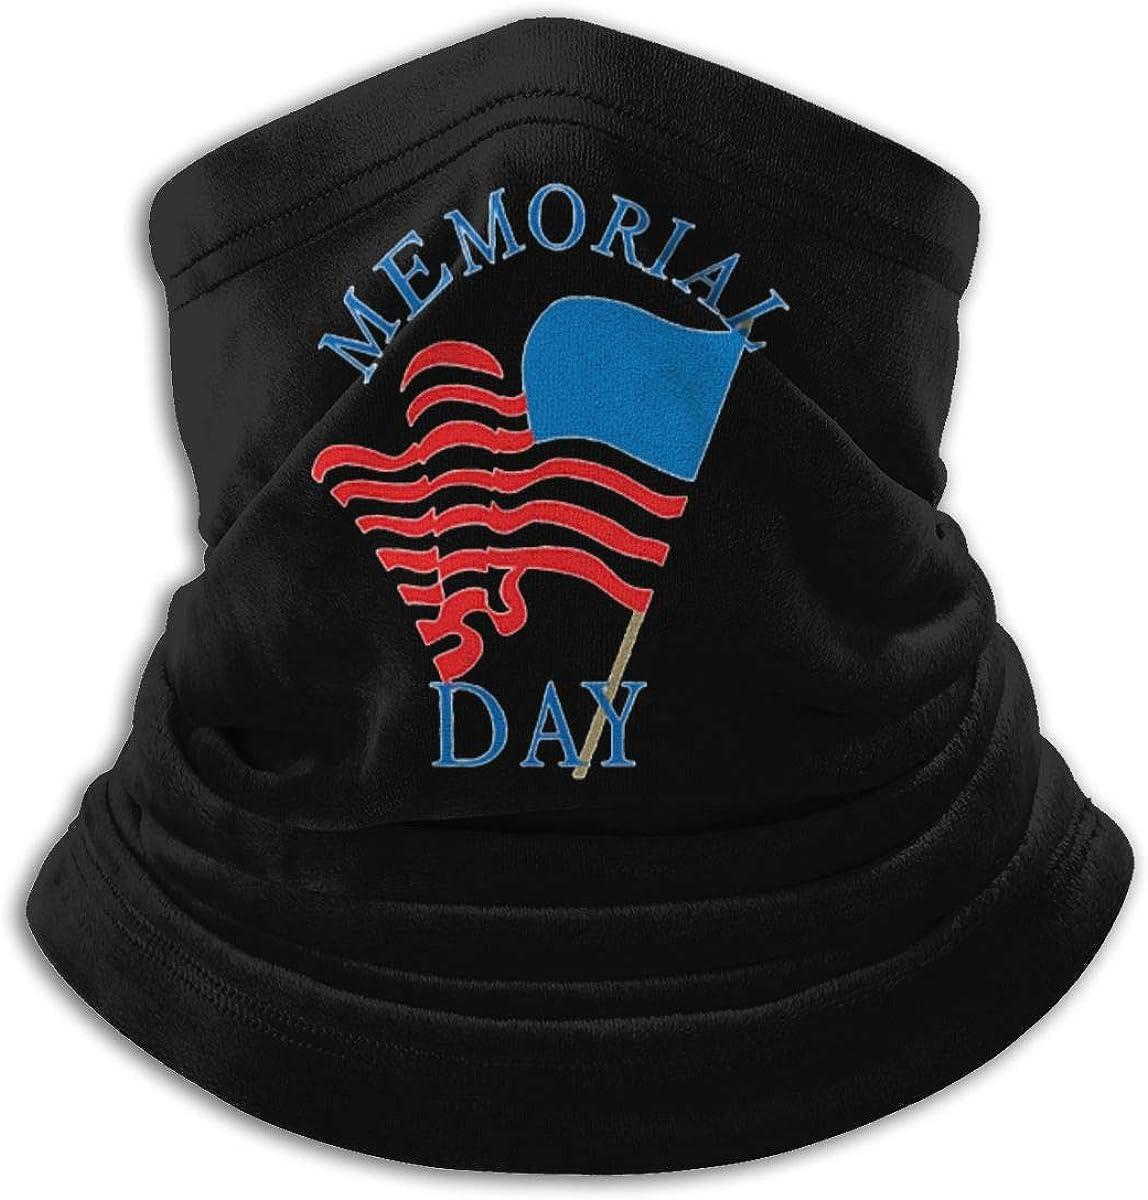 Memorial Day Black Multi-function Neck Warmer Gaiter Polyester Neck Warmer Windproof Winter Neck Gaiter Cold Weather Scarf For Men Women